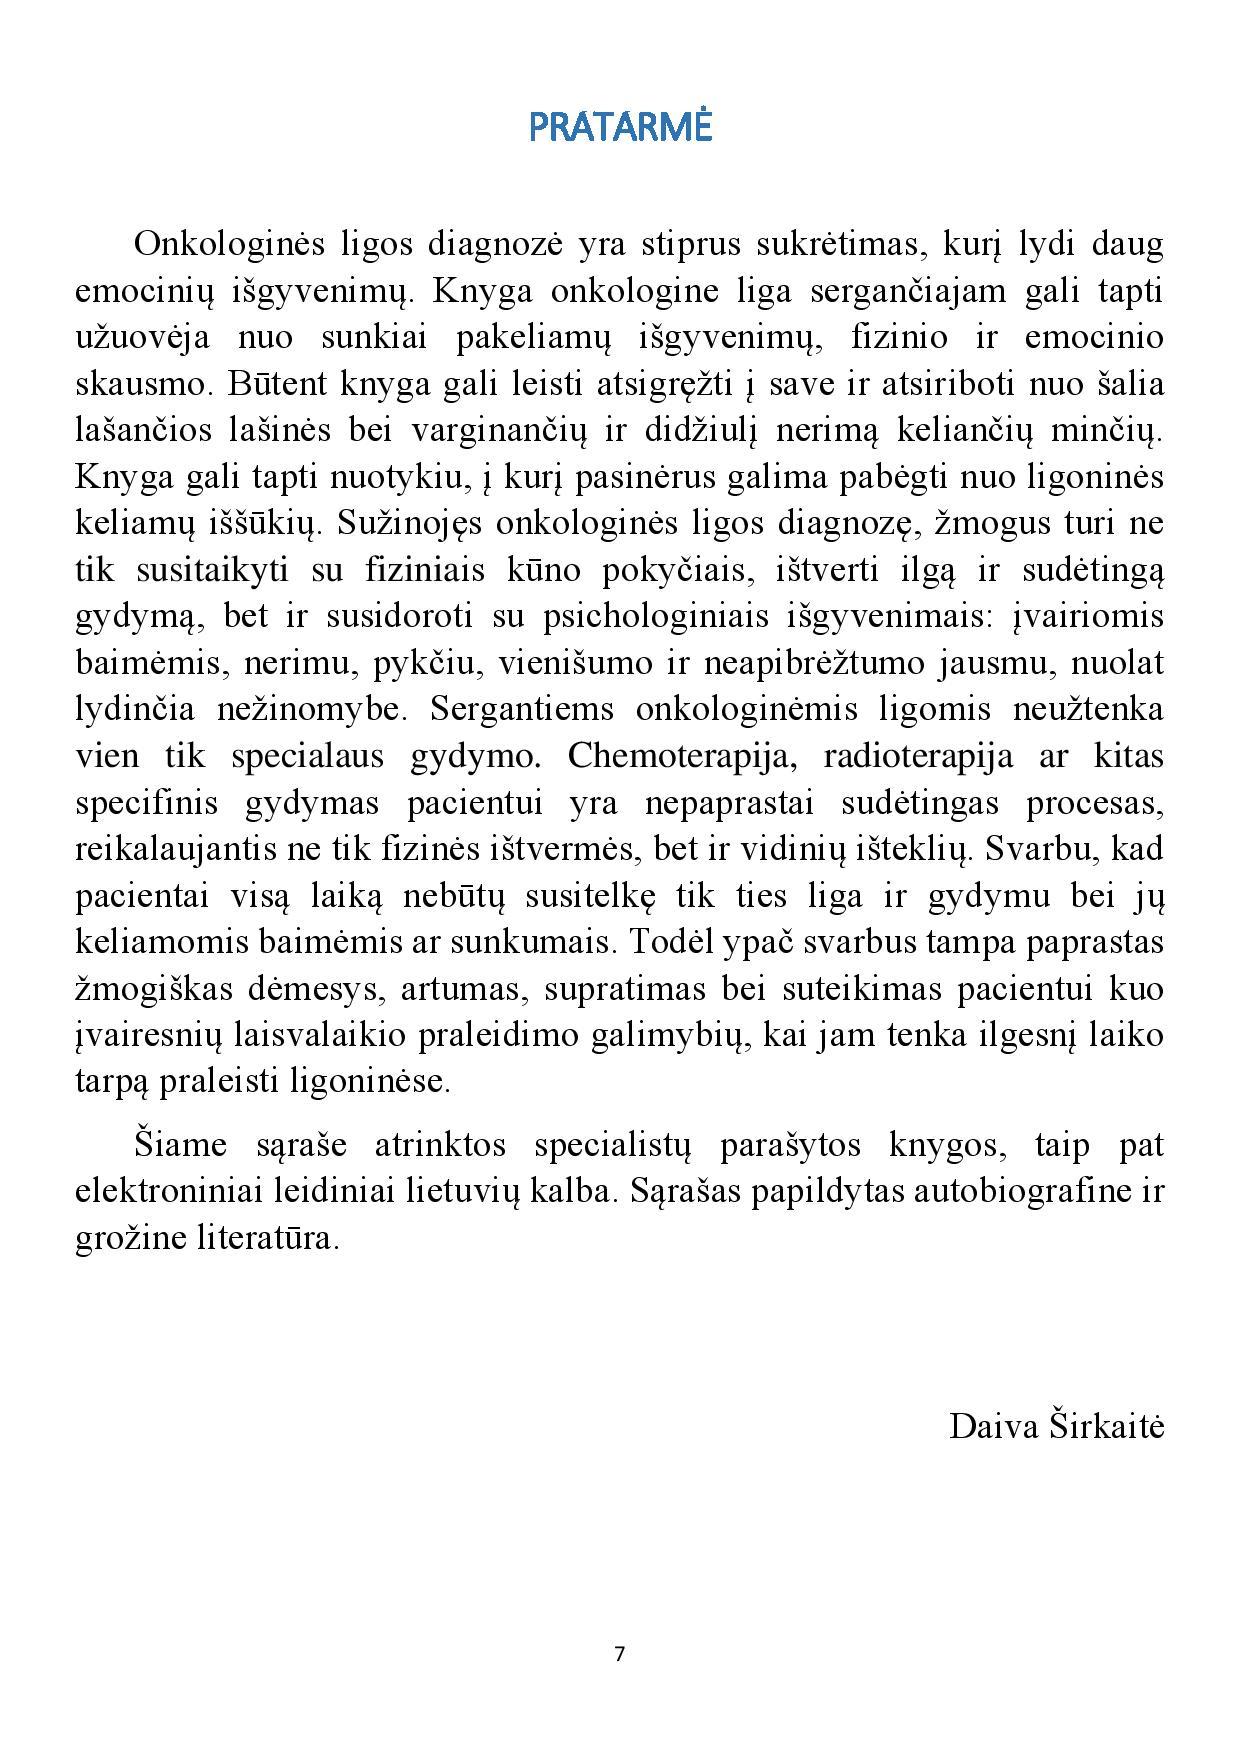 Sergantiems onkologinėmis ligomis -page-007